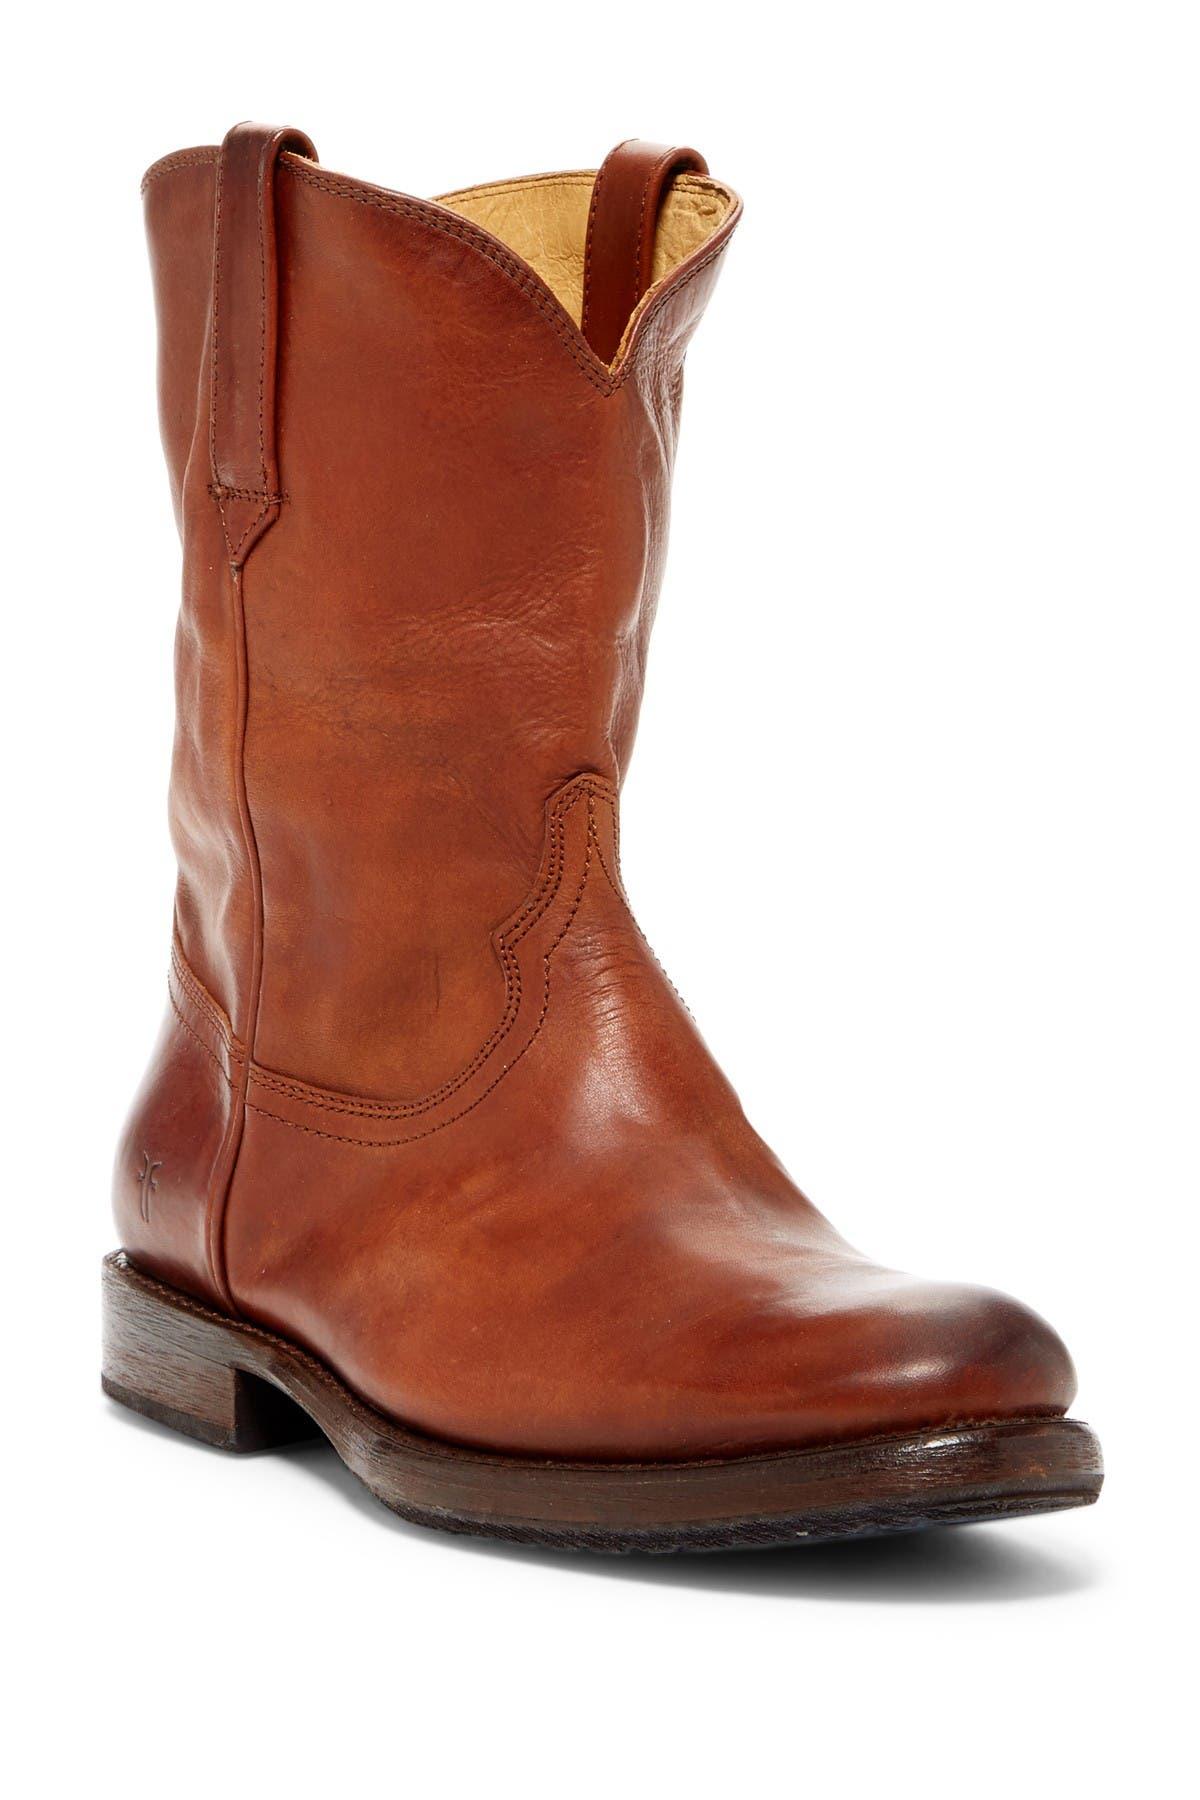 Frye Duke Roper 81311 Mens Brown Suede Western Slip On Boots Shoes